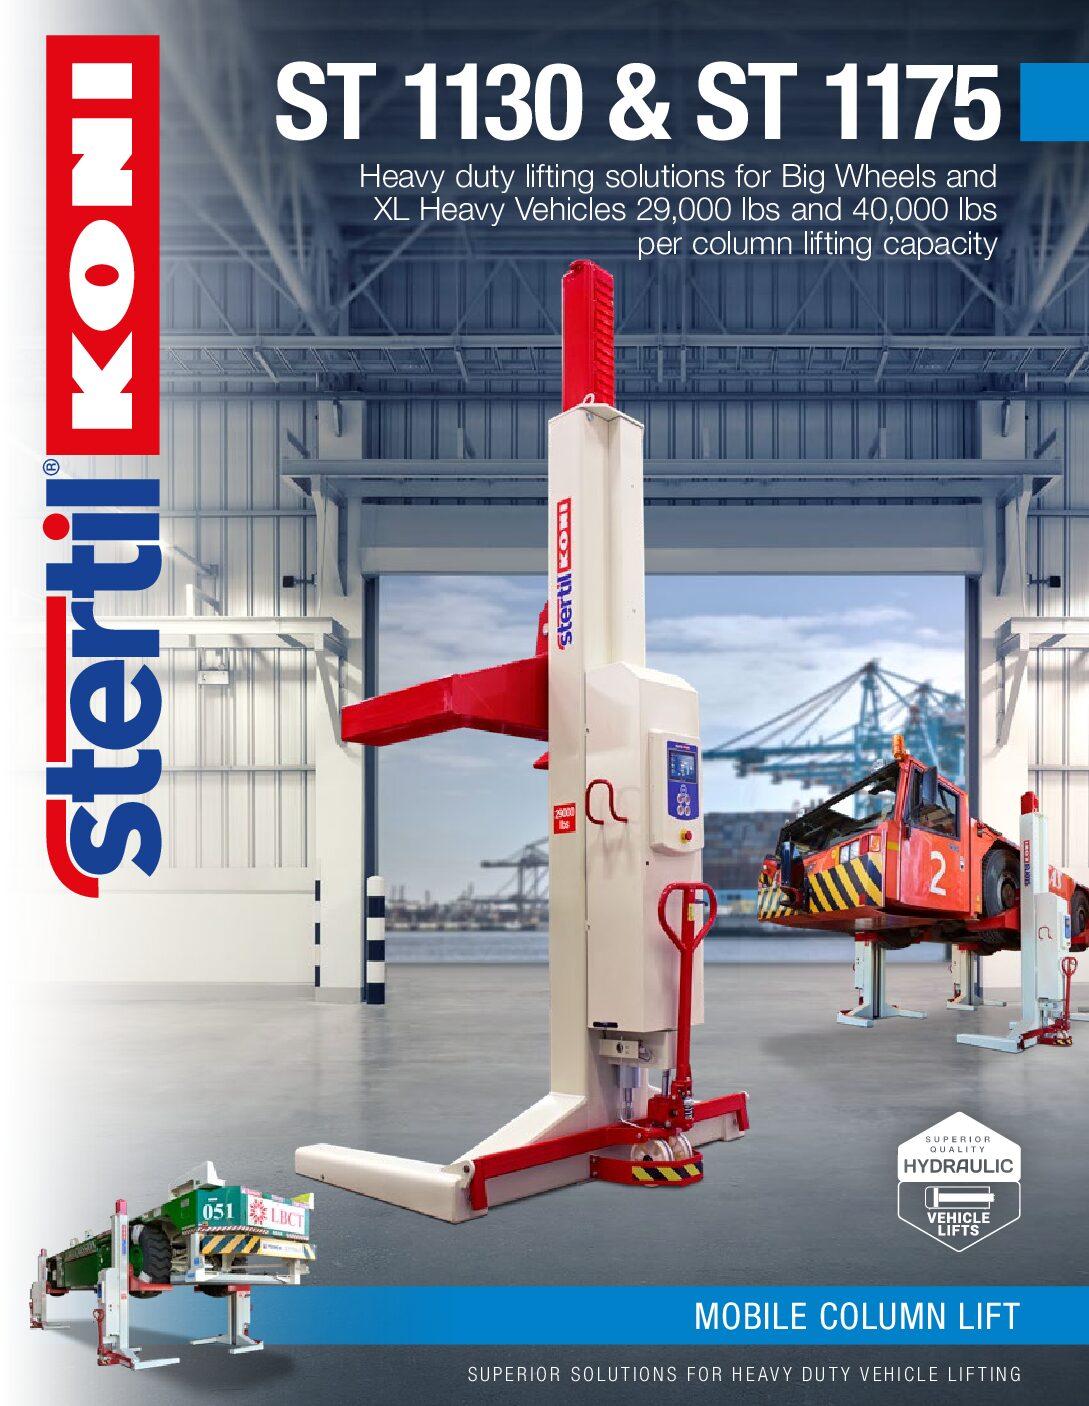 Stertil-Koni: ST 1130 and ST 1175 – US Version